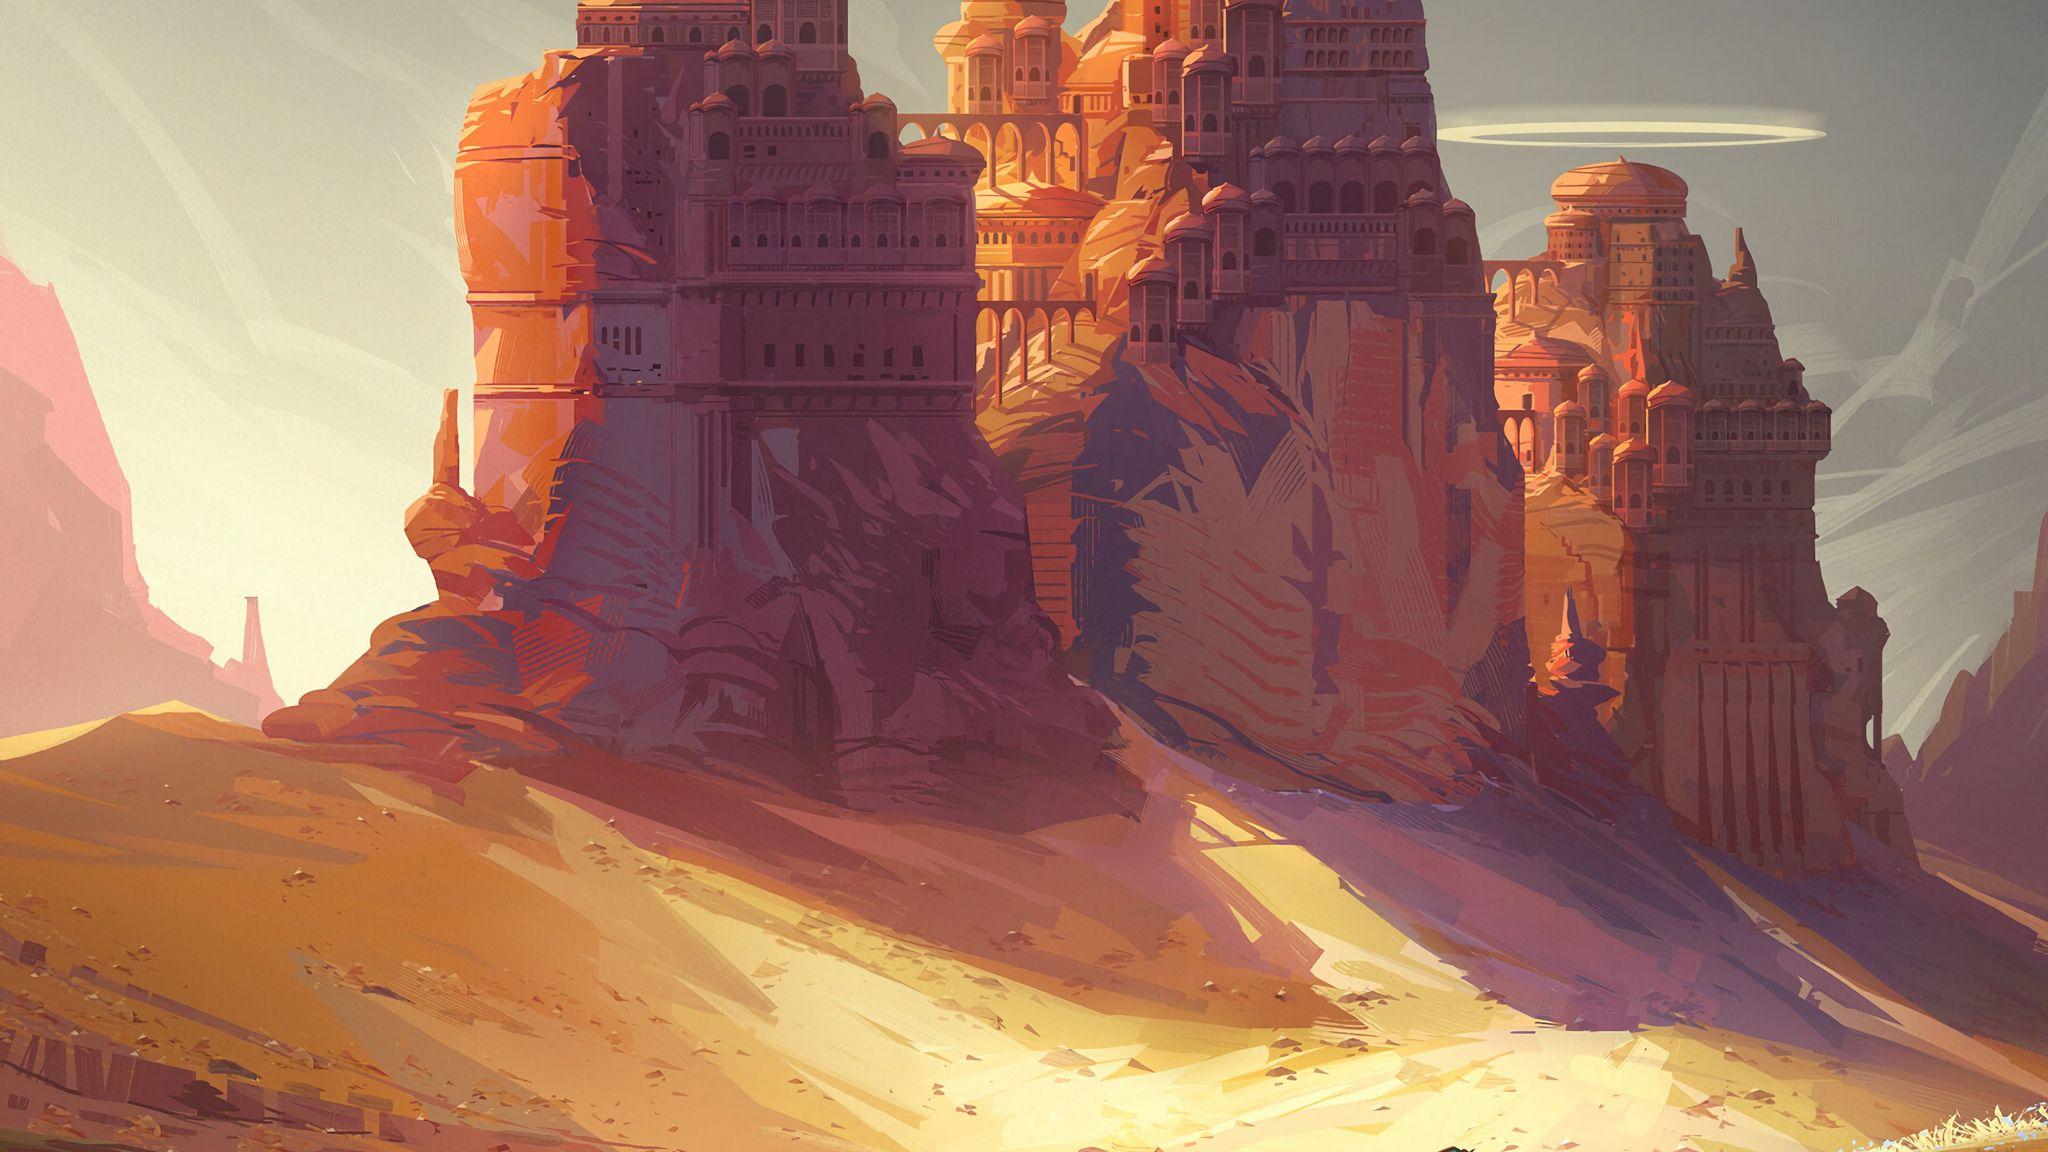 2048x1152 Wallpaper friends, adventure, castle, art